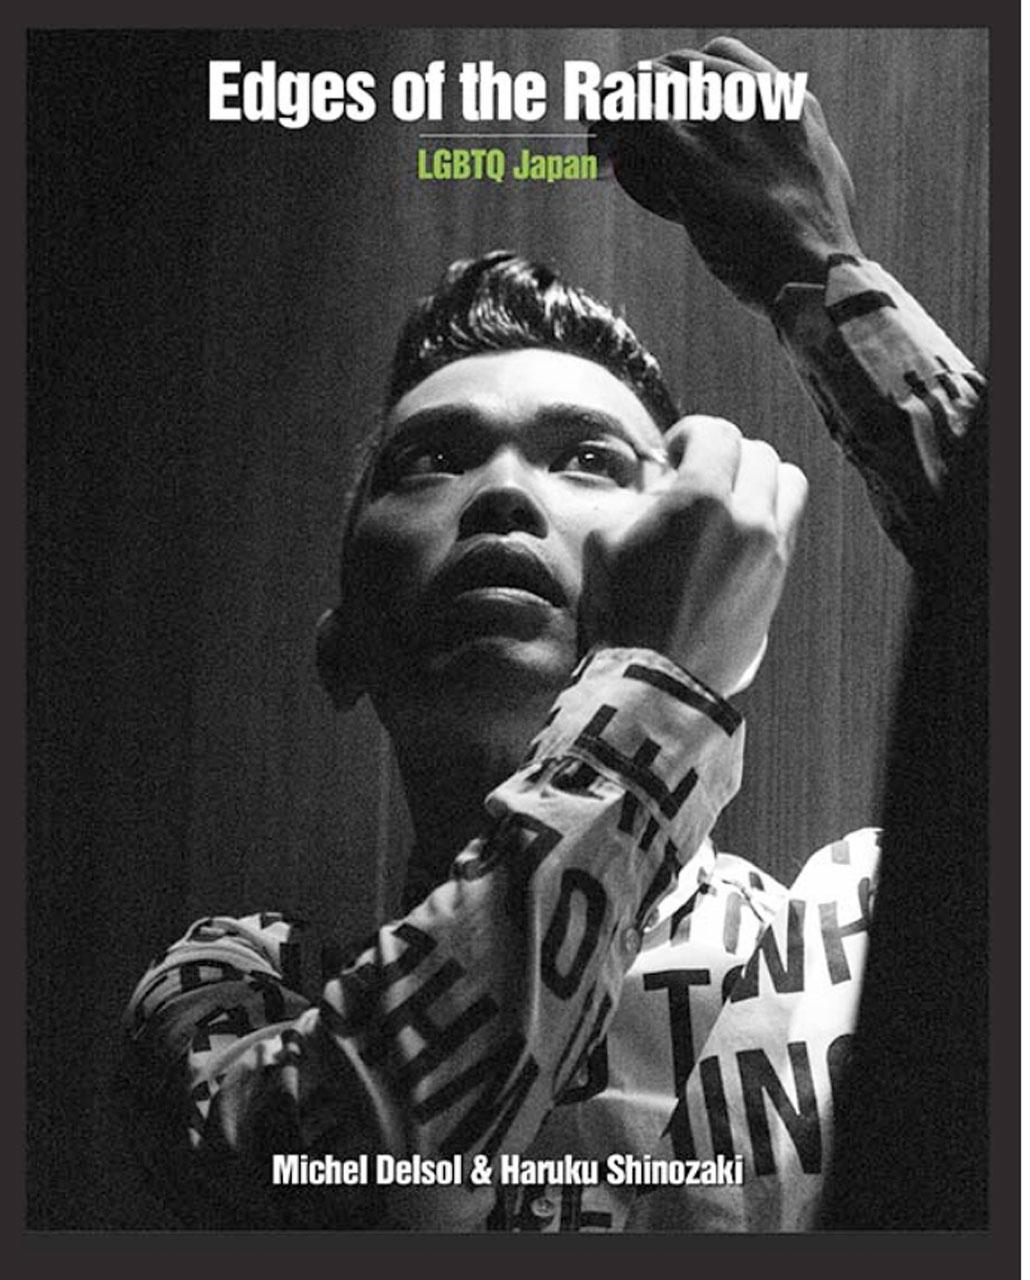 EDGES OF THE RAINBOW LGBTQ JAPAN by Michel Delsol and Haruko Shinozaki